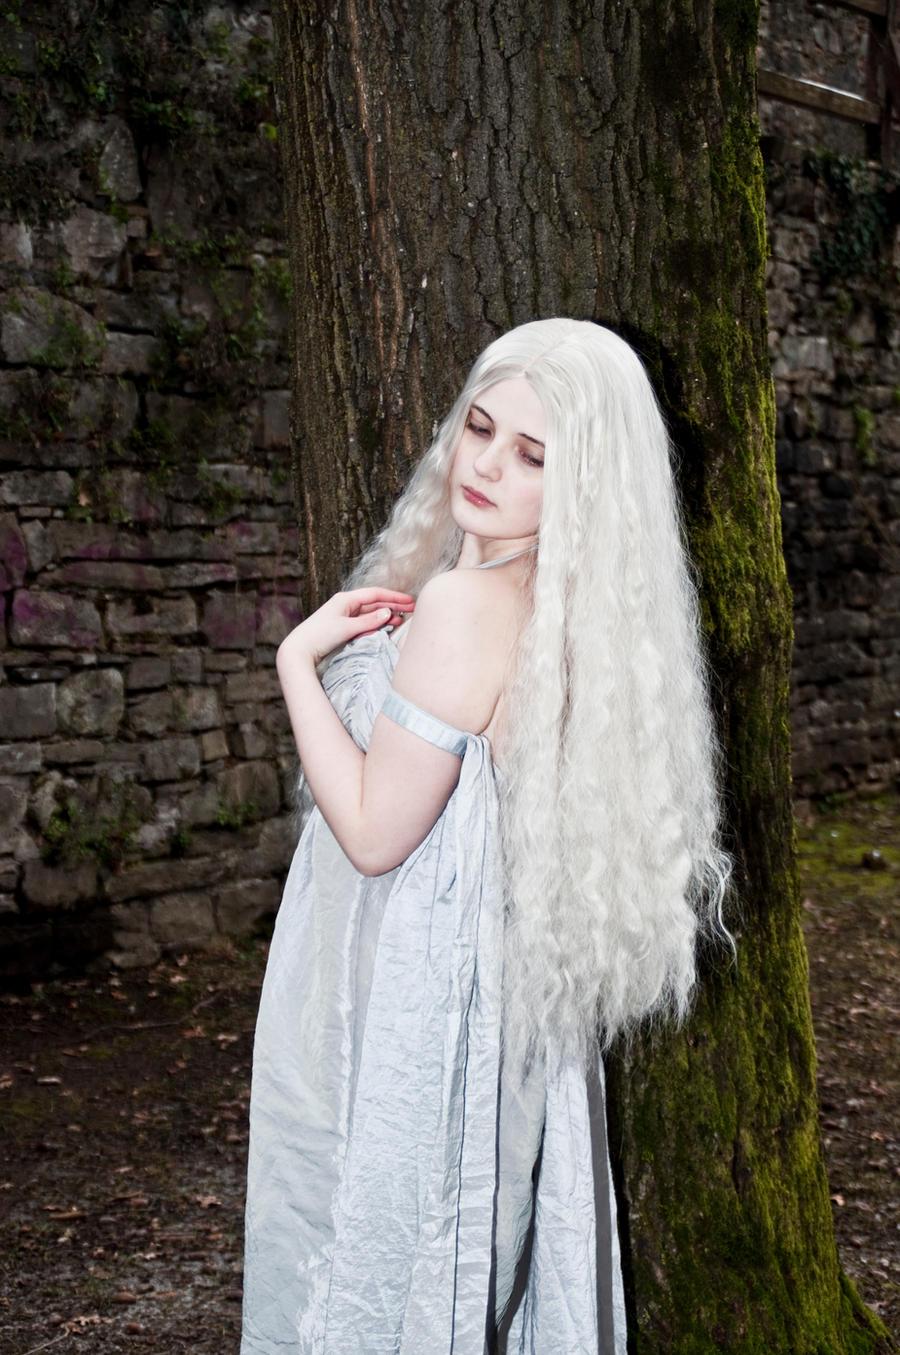 Daenerys Stock 2 by MikkiCrossCC